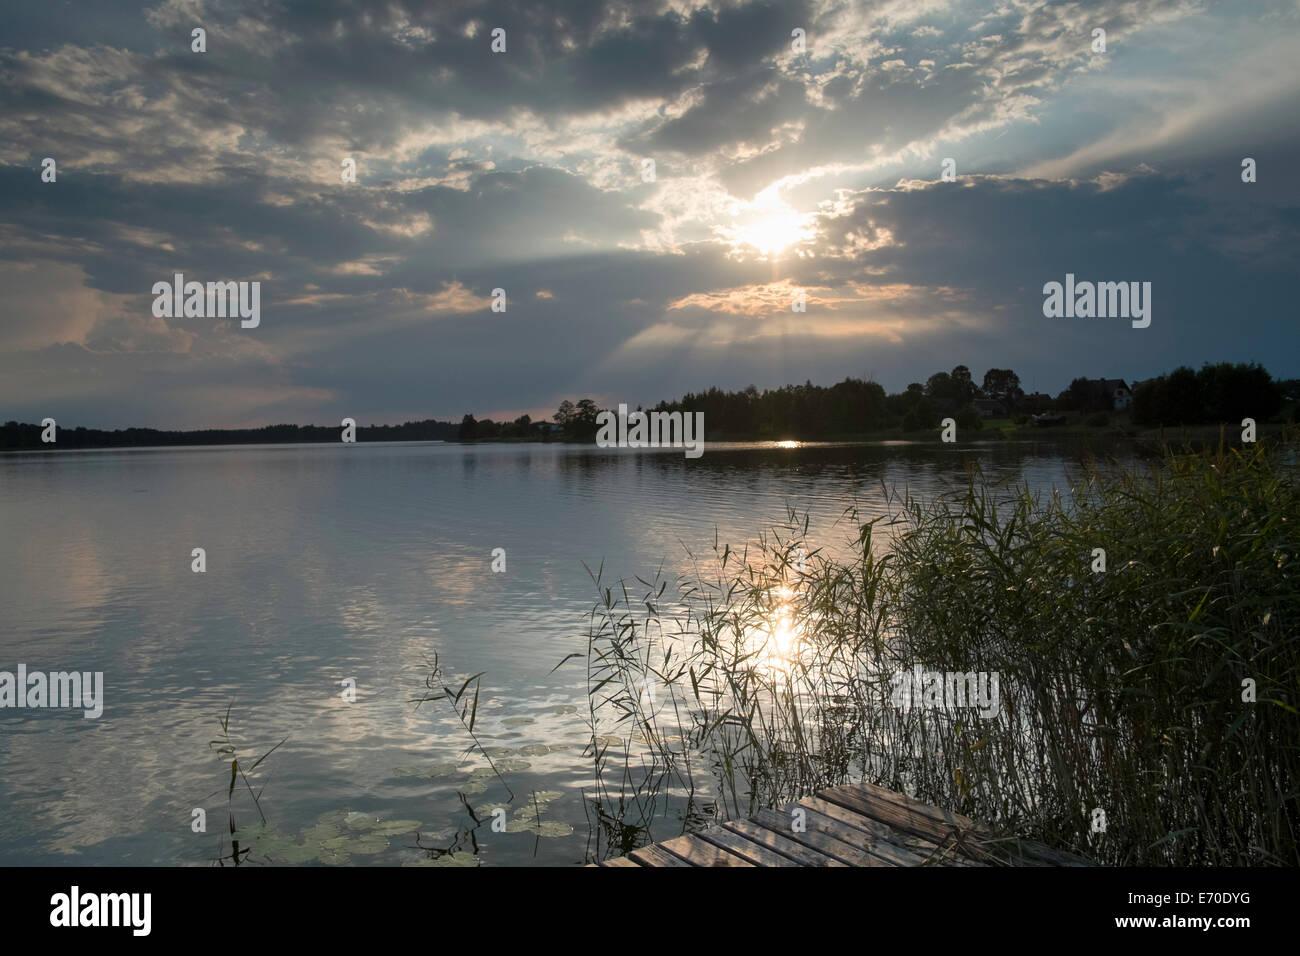 scenic lake view Poland water summer sky drama - Stock Image